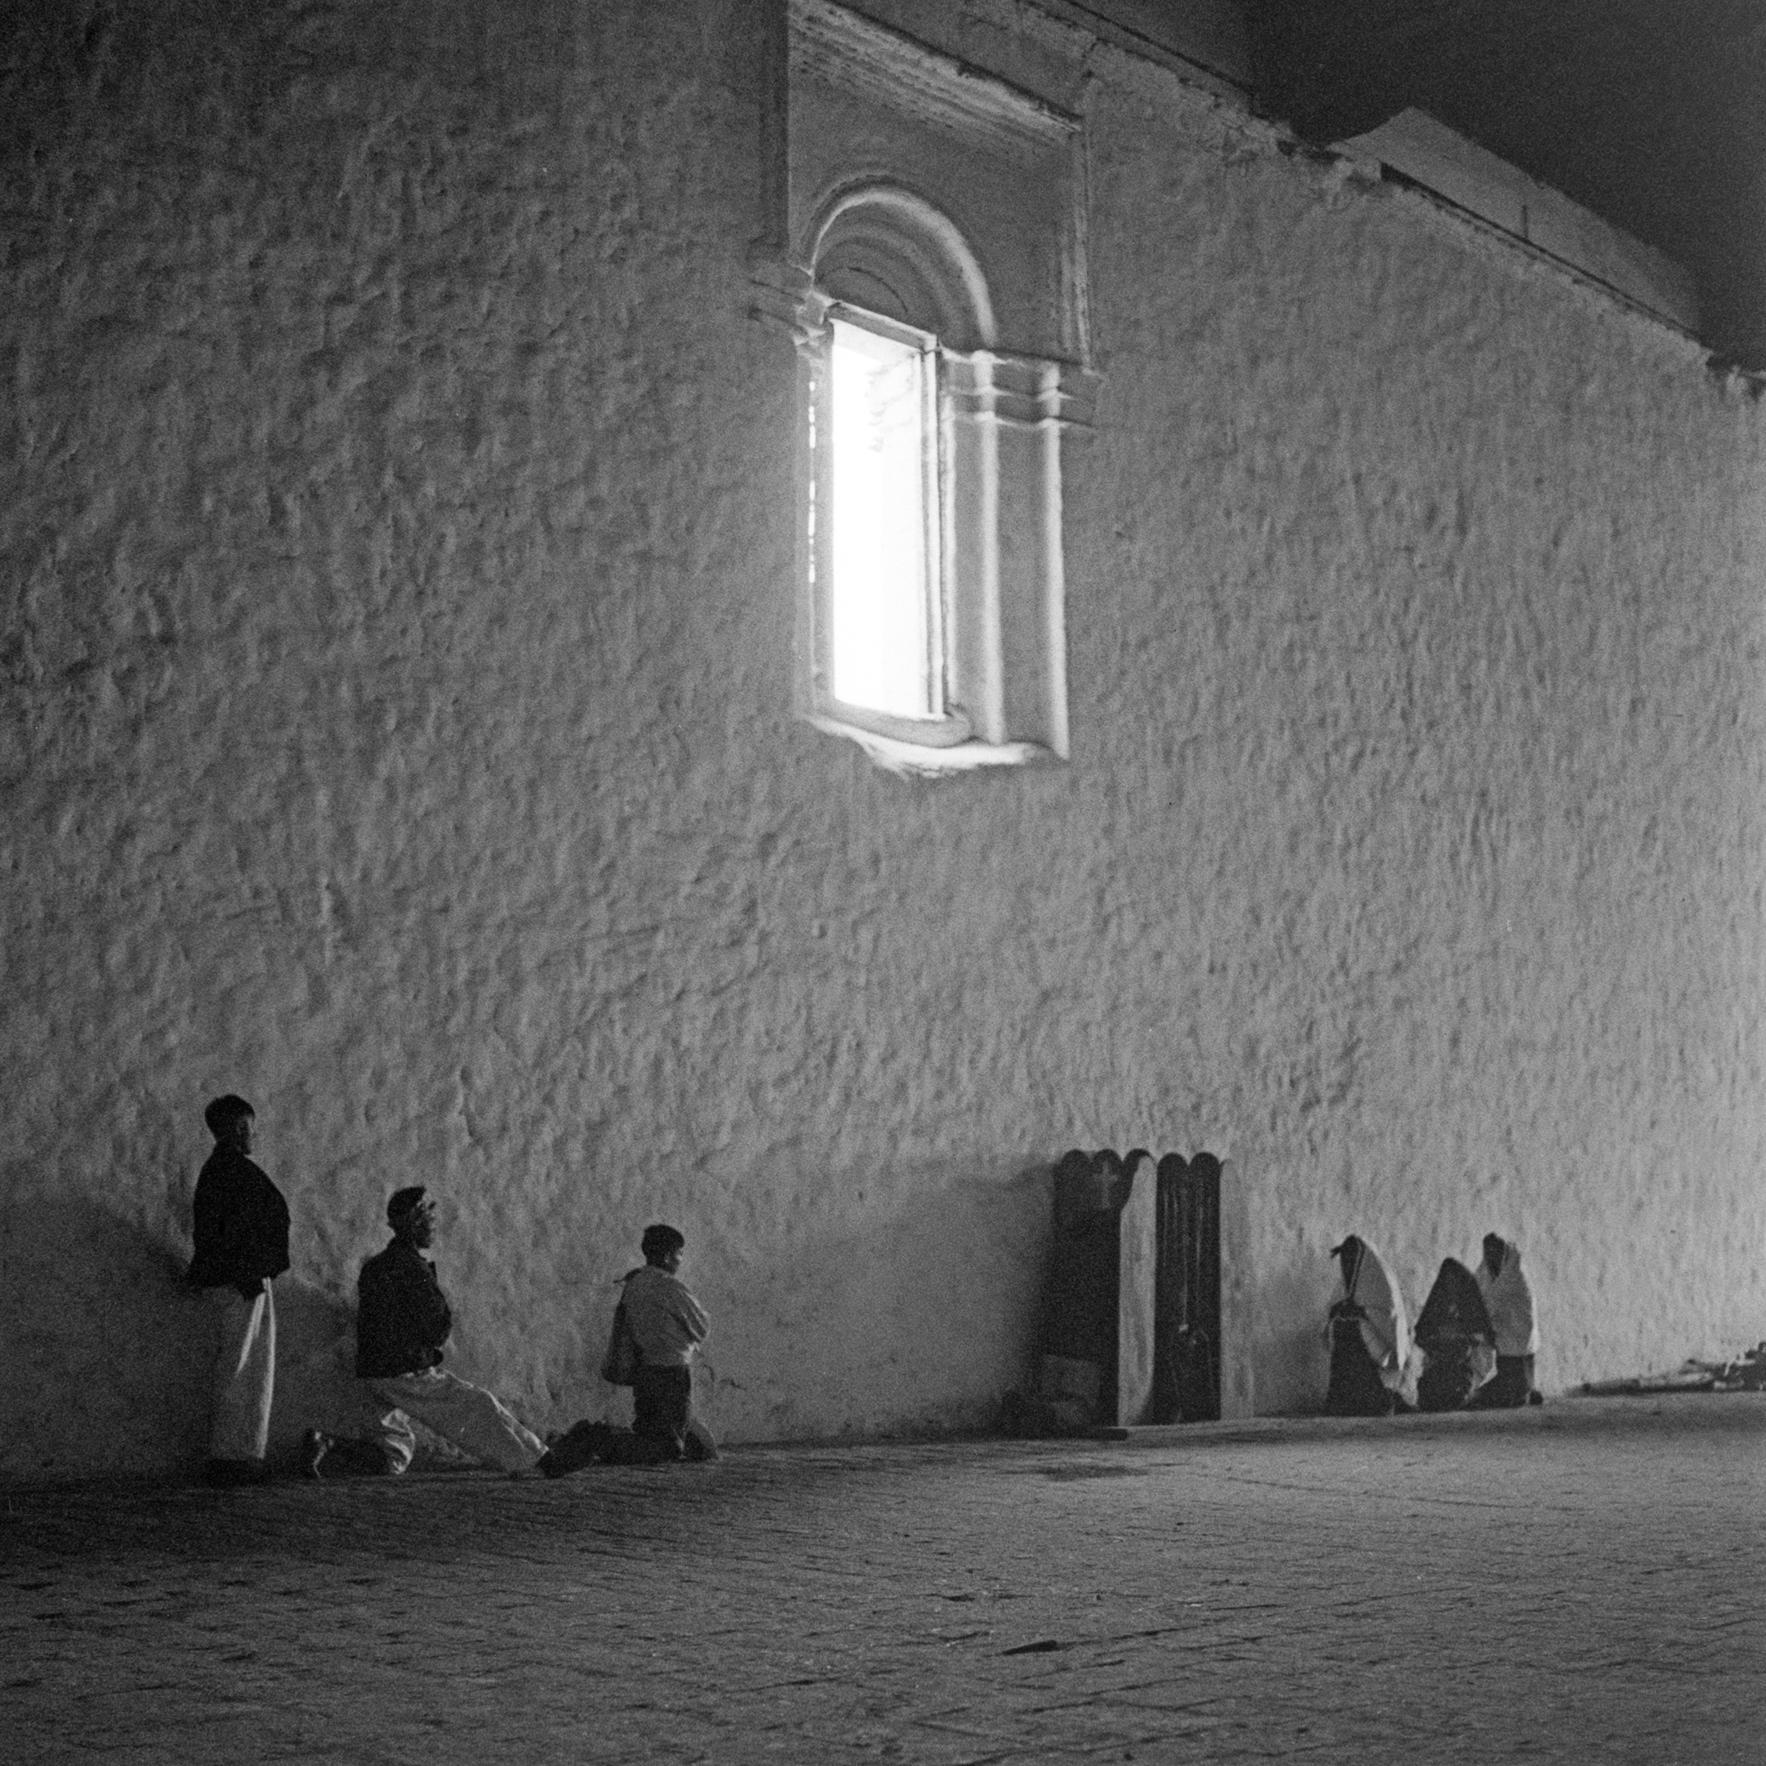 Chajul, Guatemala. 1962.